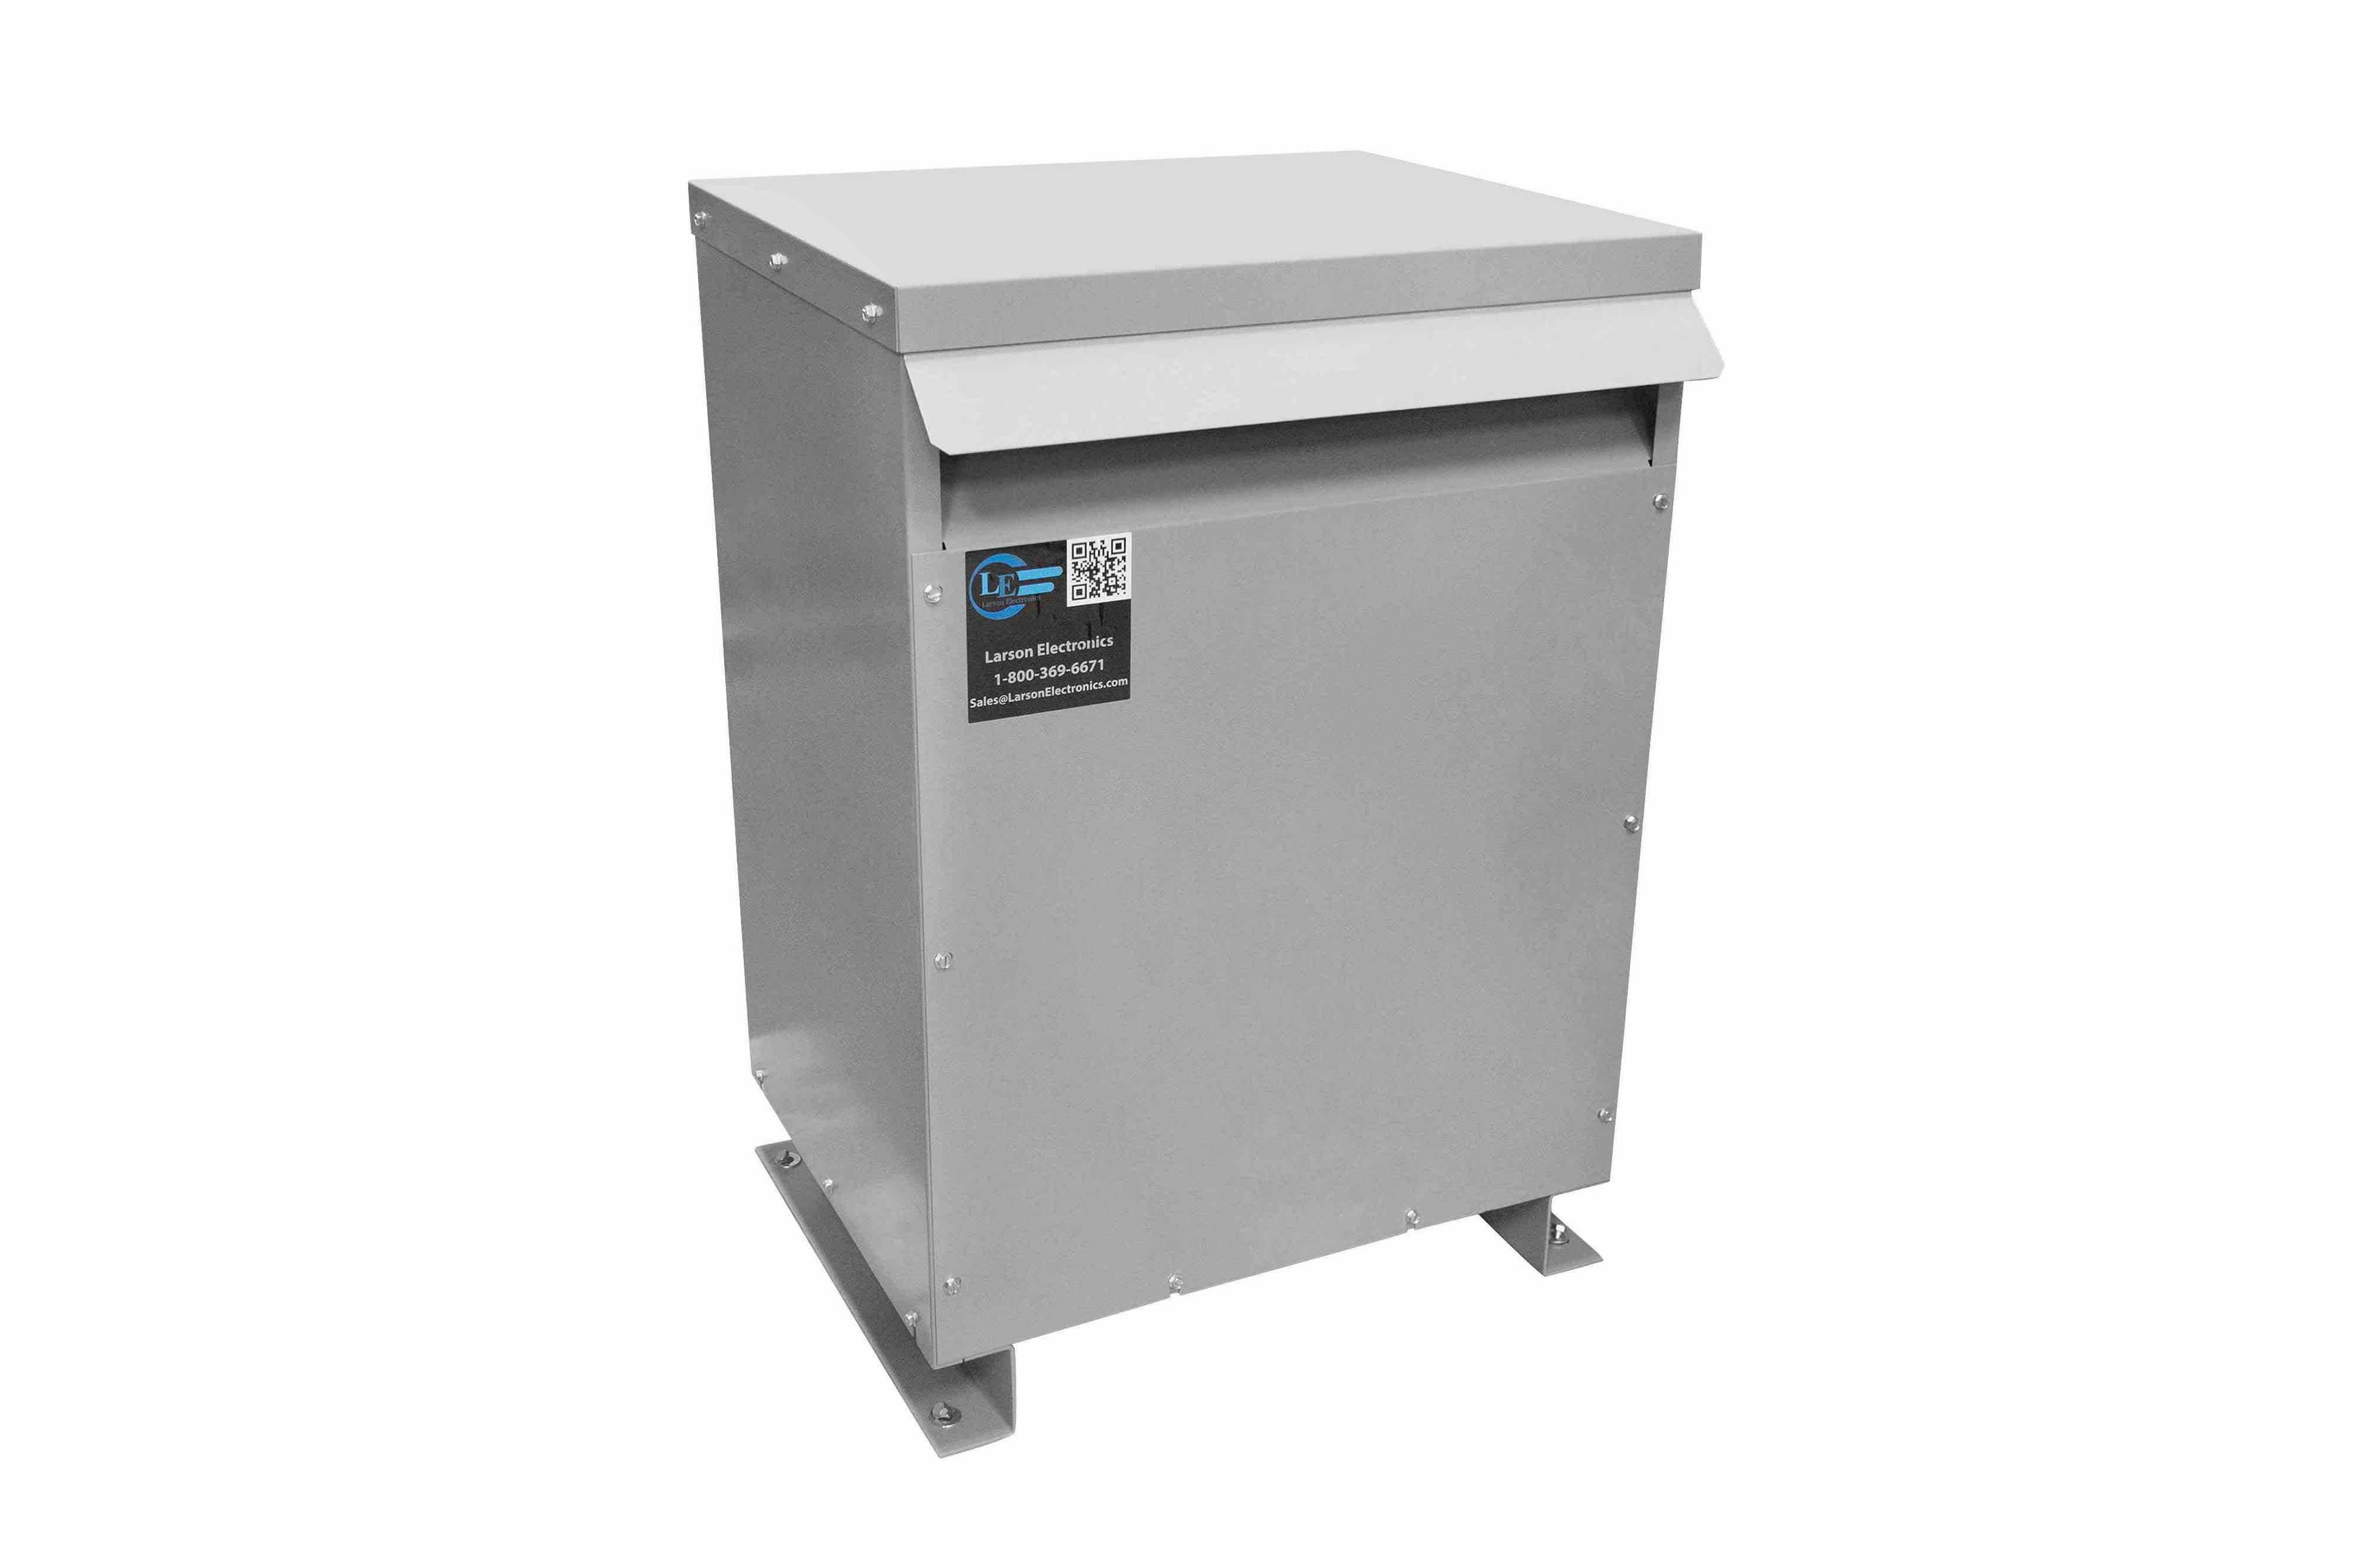 125 kVA 3PH Isolation Transformer, 208V Wye Primary, 415V Delta Secondary, N3R, Ventilated, 60 Hz